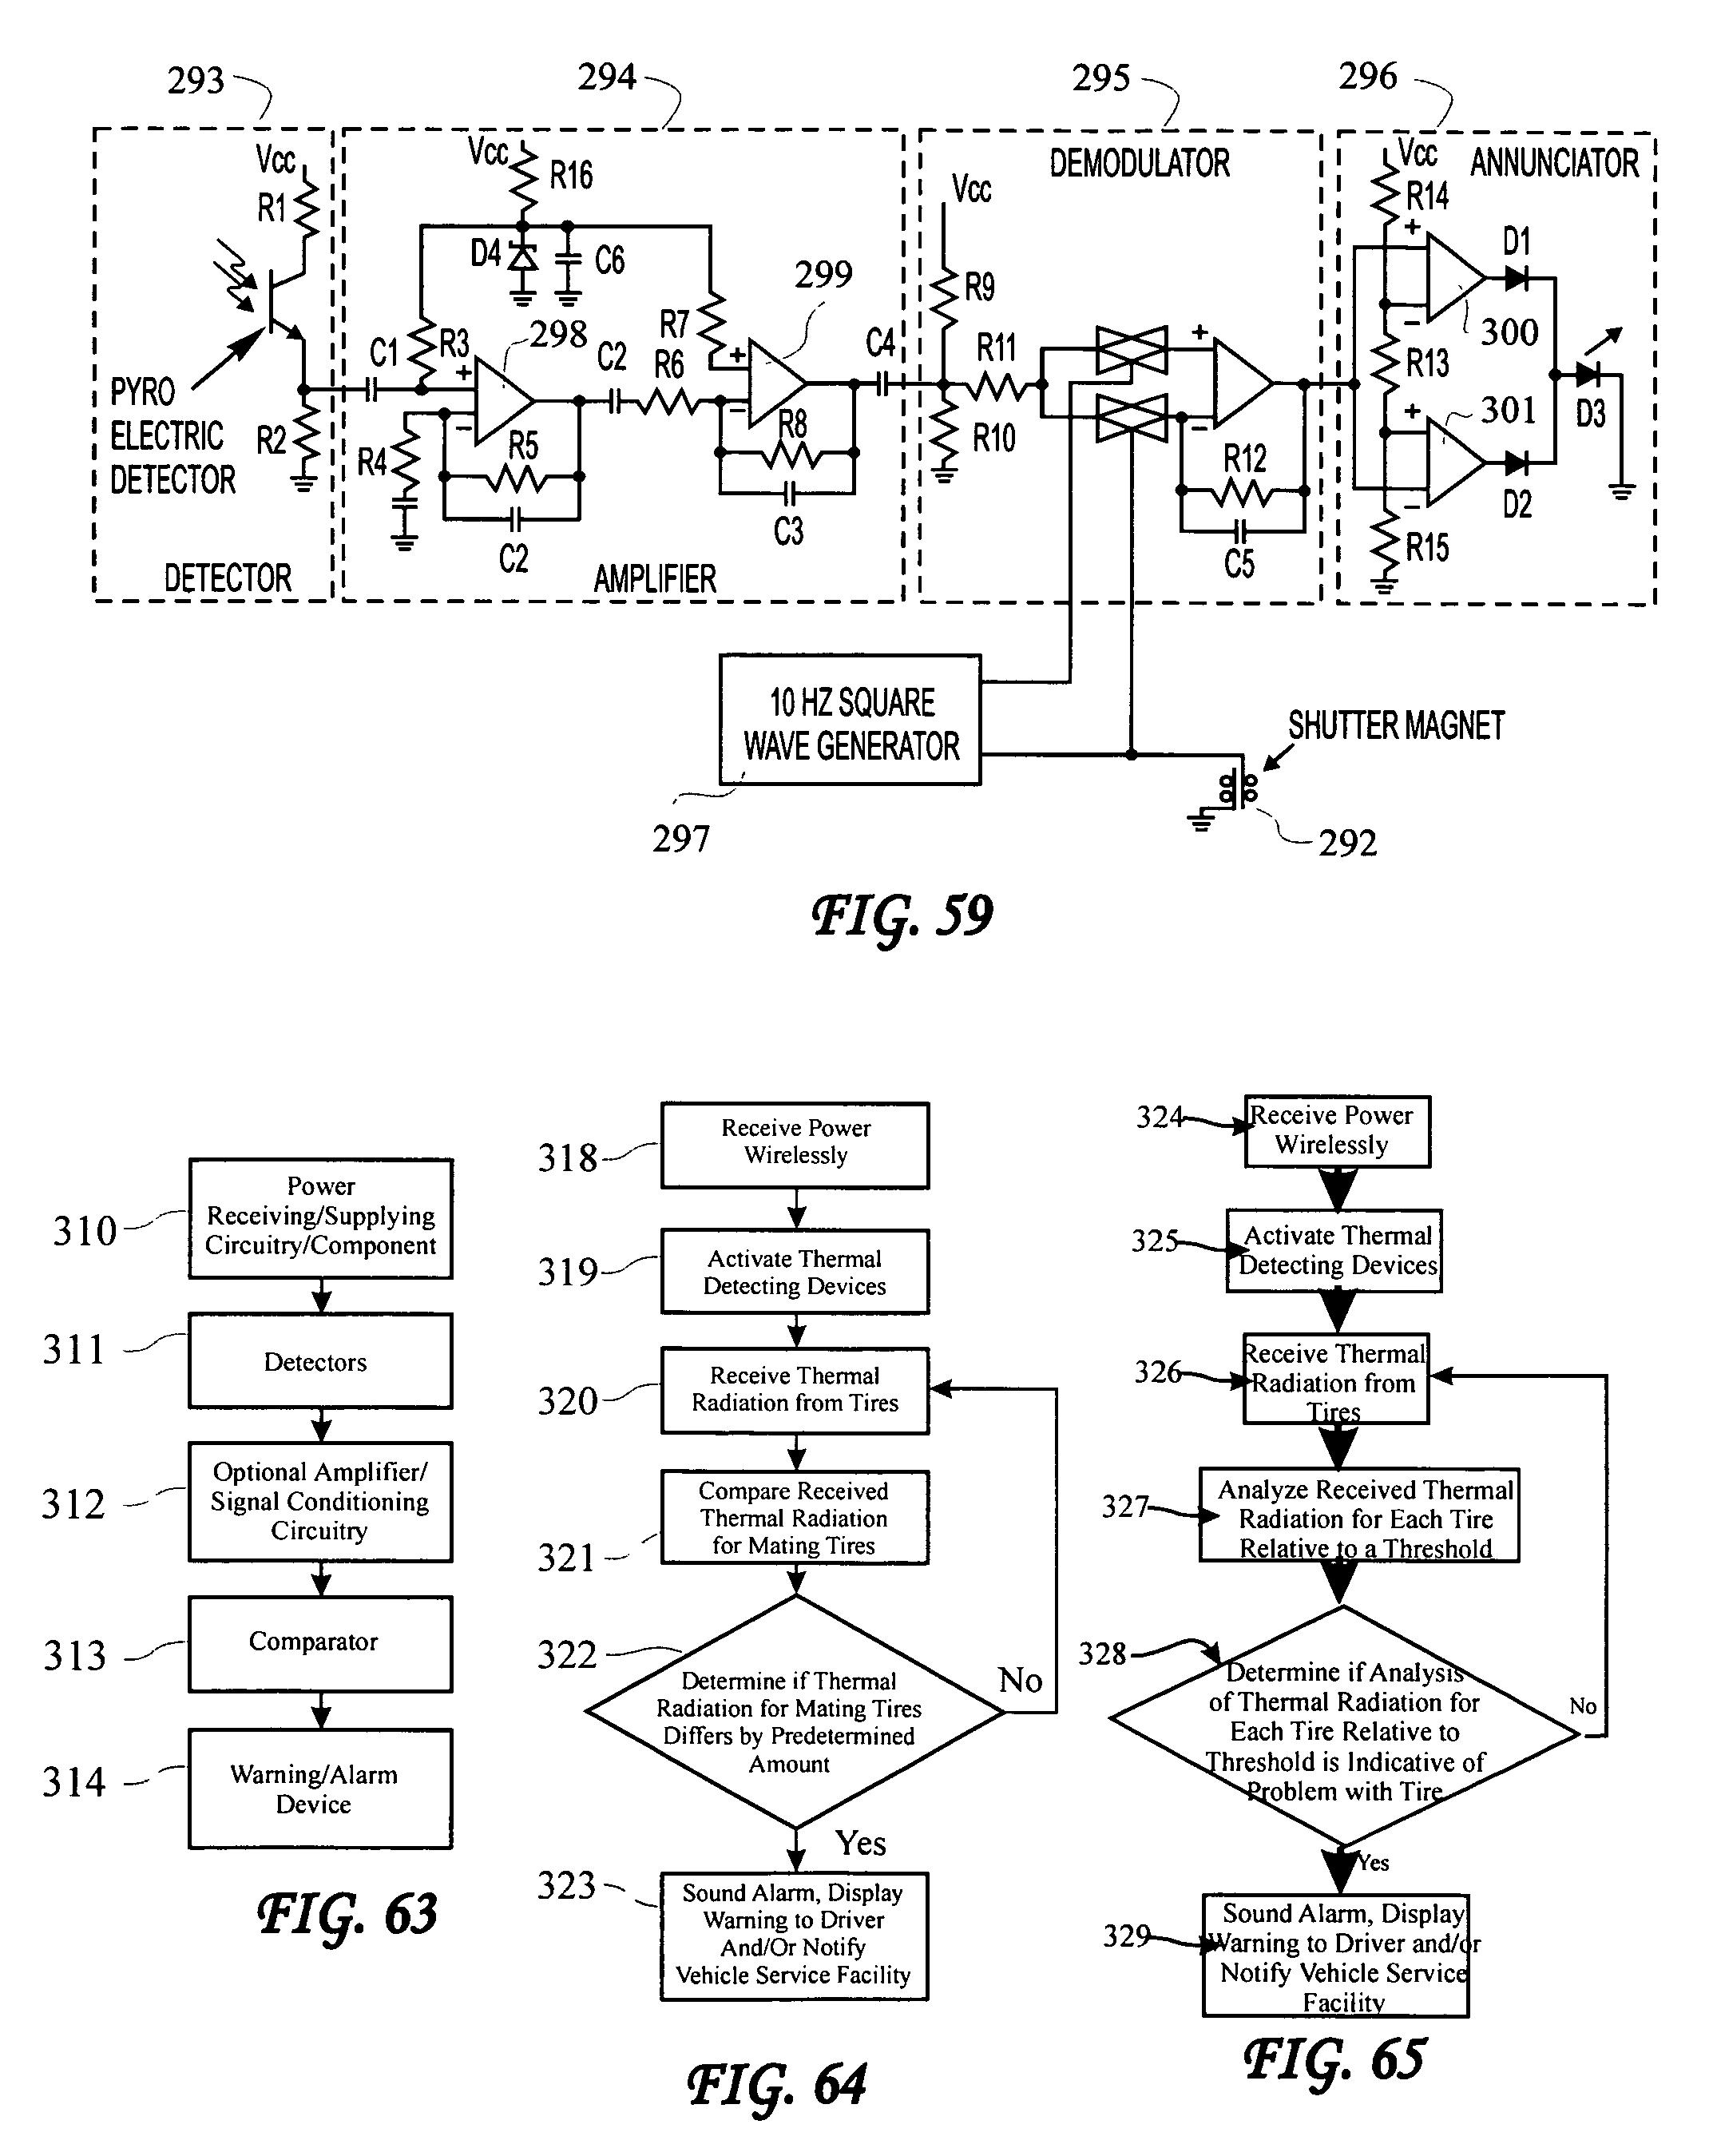 Patent US 7,089,099 B2